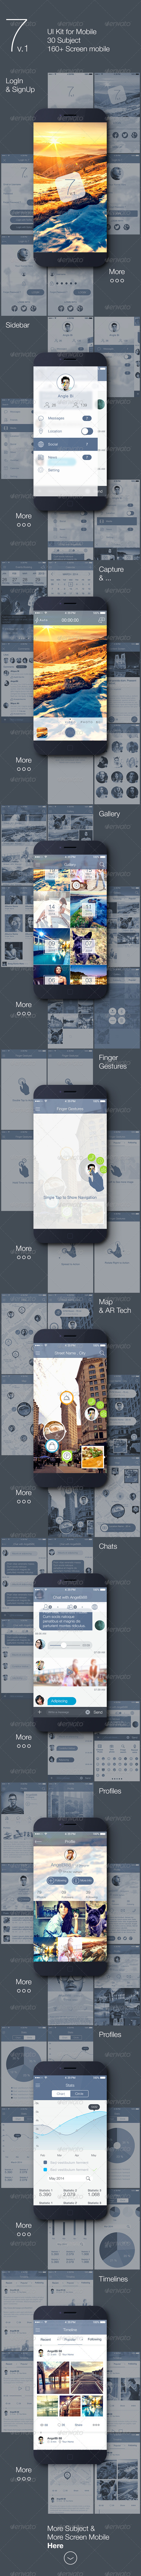 GraphicRiver 7 v.1 Mobile UI Kit 7518884